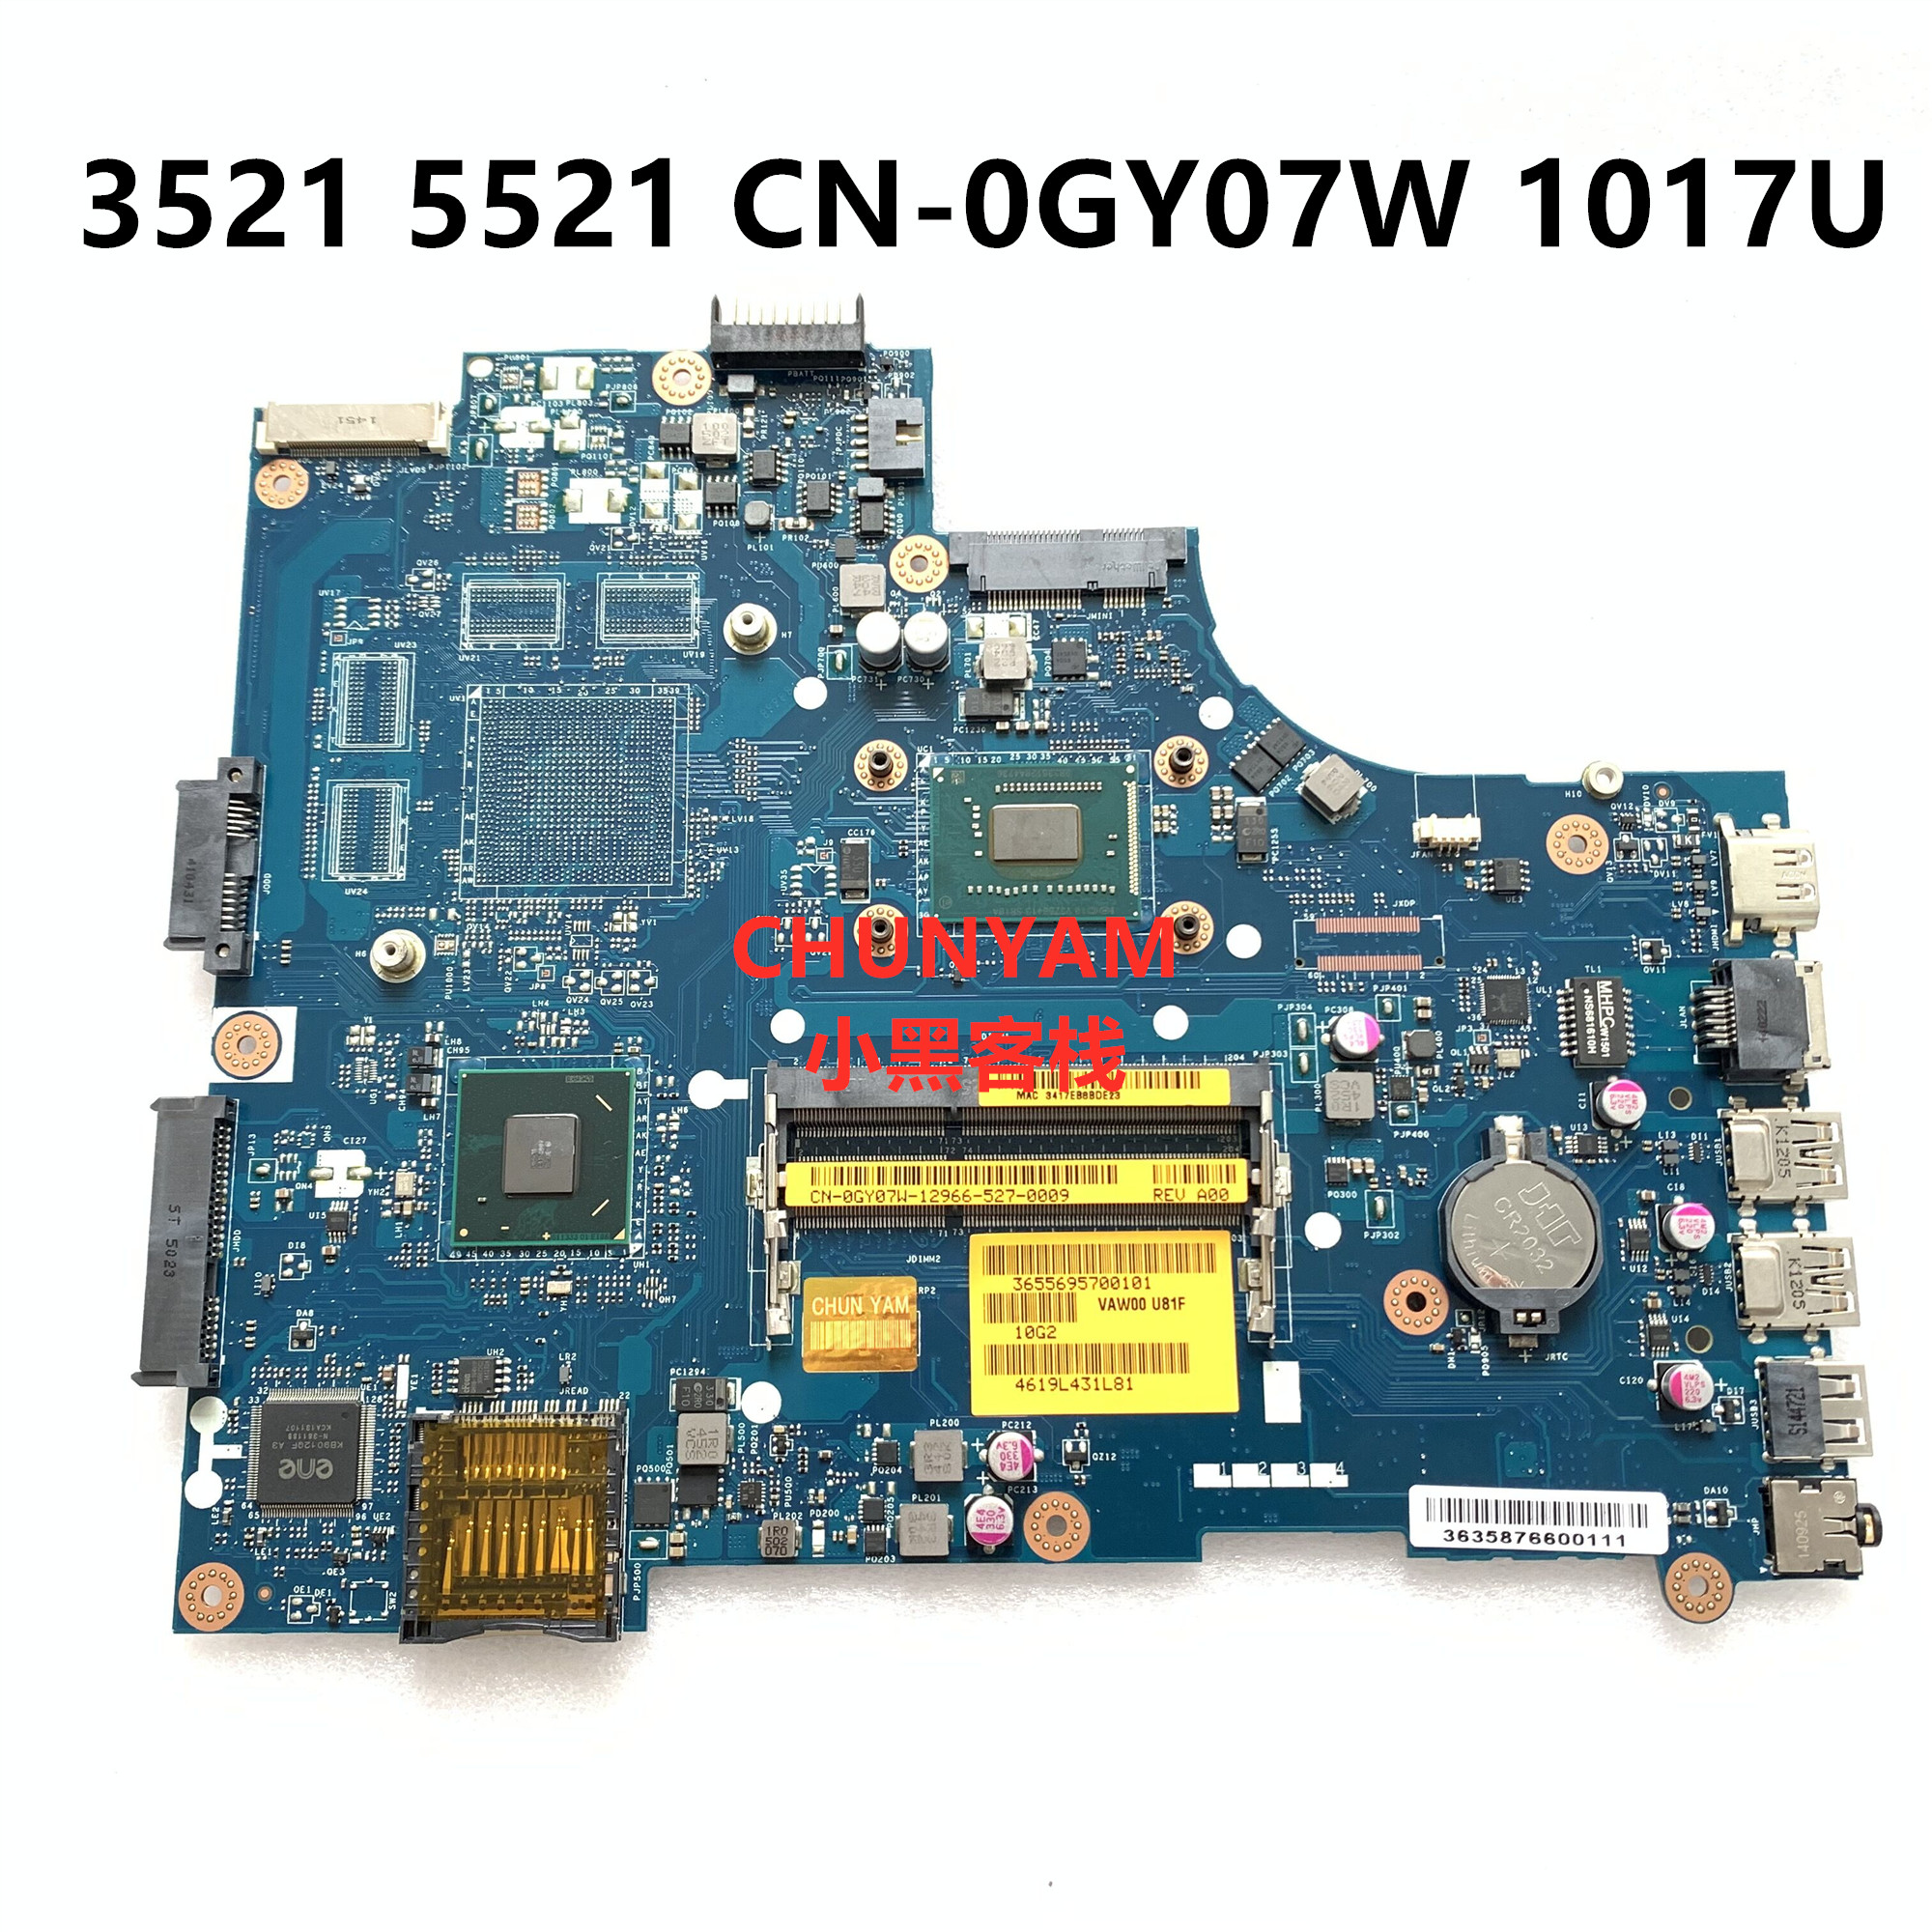 KEFU Mainboard NOTEBOOK 3521 LA-9104P INSPIRON DELL Laptop FOR 2521/3521/5521 1017u/Cn-0gy07w/0gy07w/Gy07w